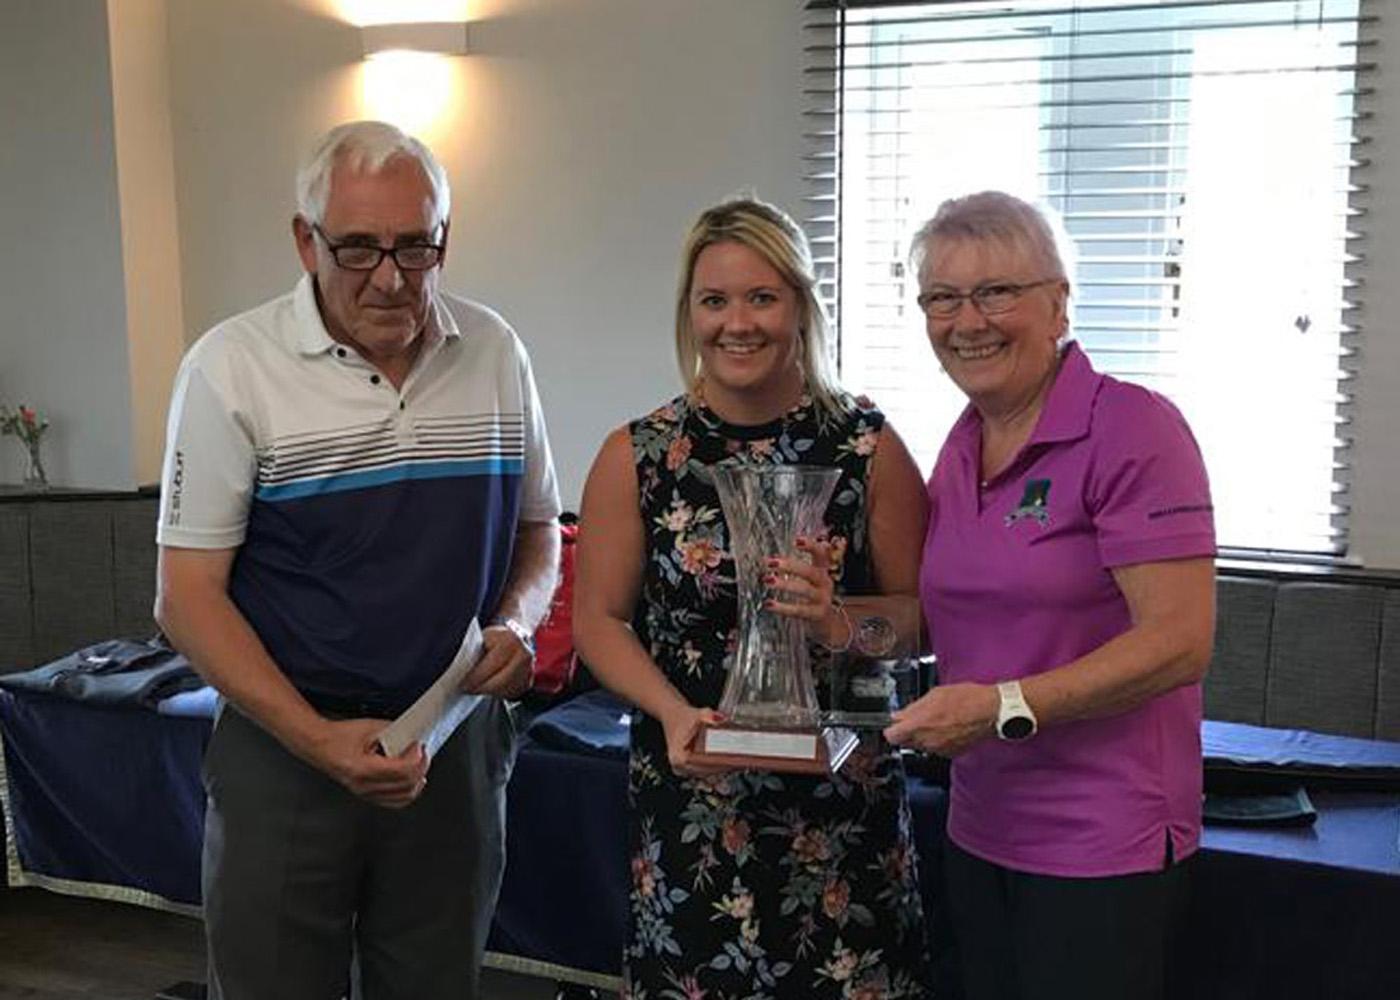 Ladies Club Championship - 21st July 2019